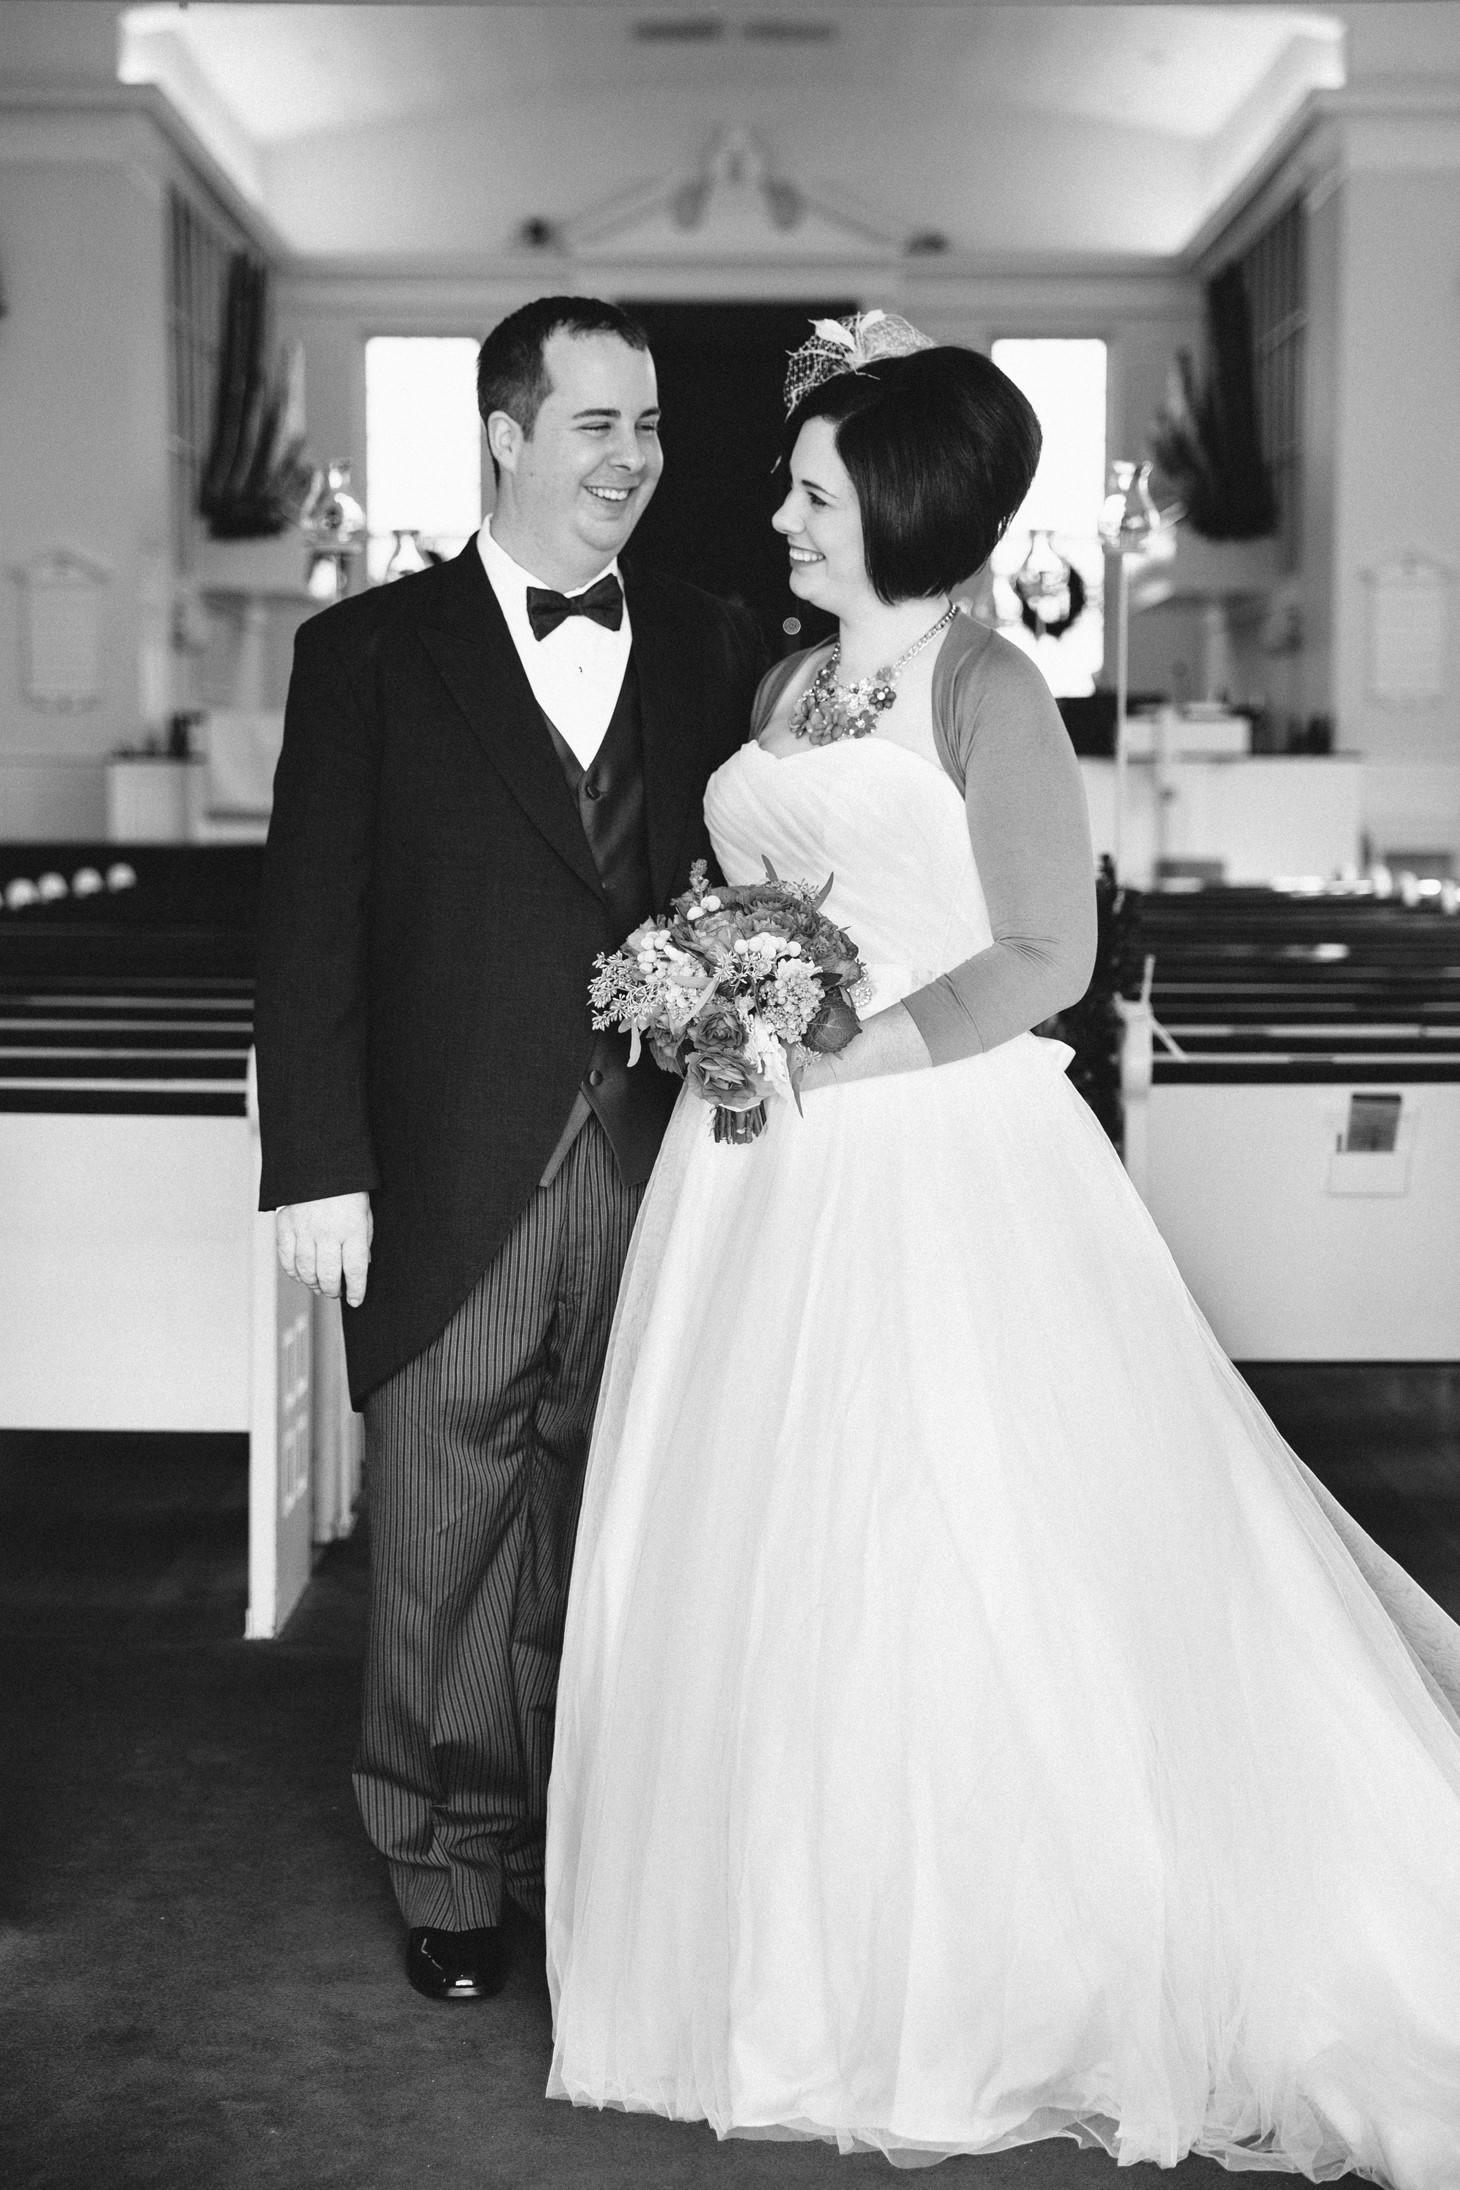 028-nyc-wedding-photographer-smitten-chickens-nj-montclair-art-museum.jpg